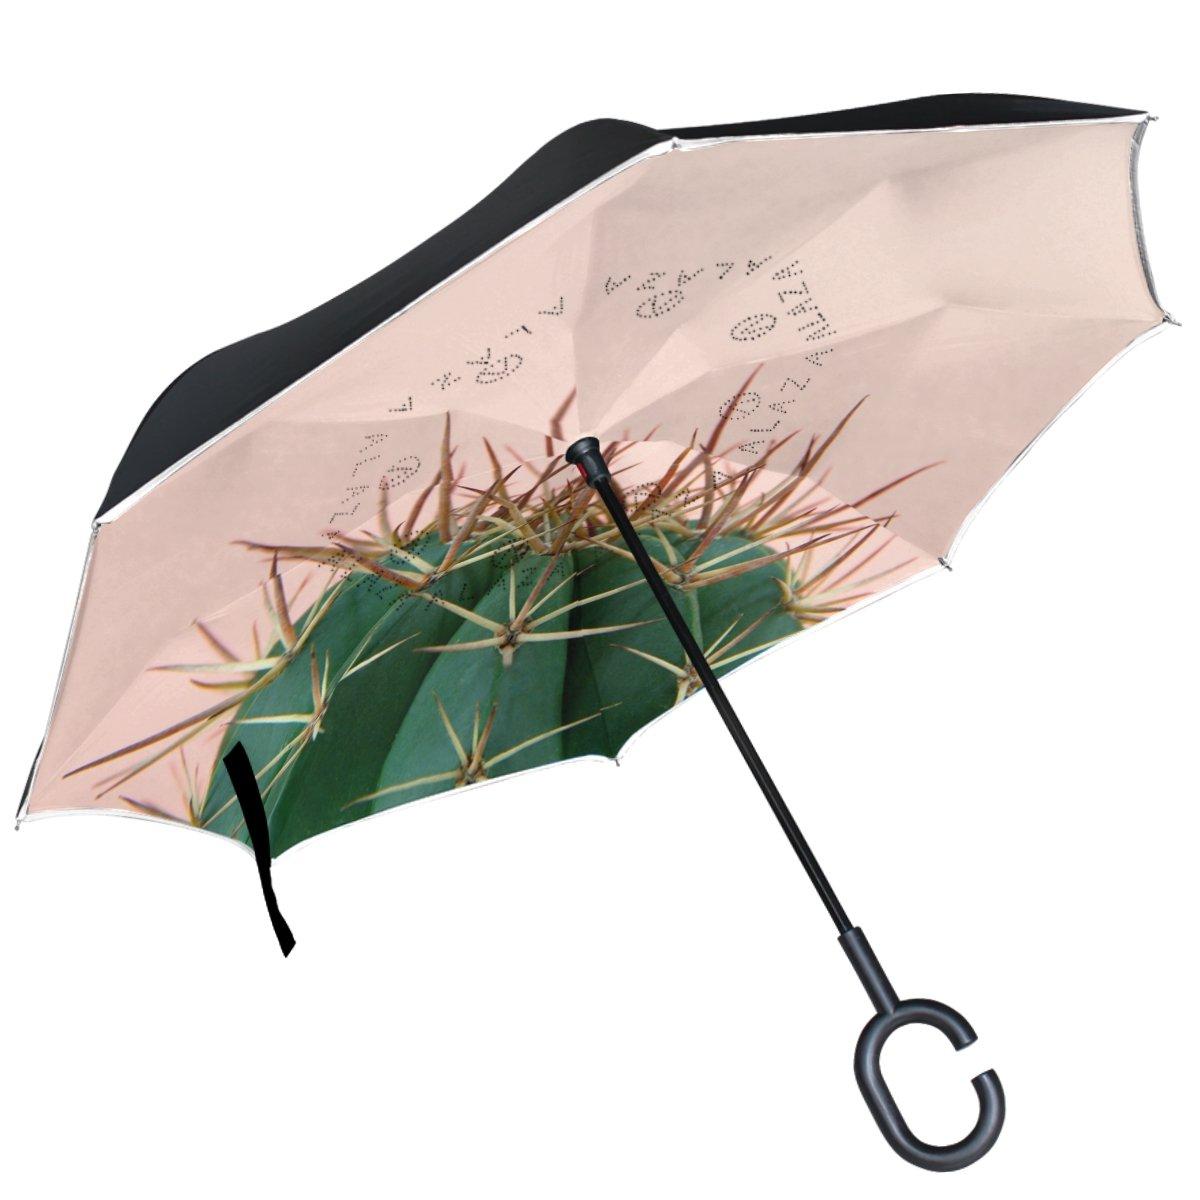 9521b8643b ALAZA Cactus Inverted Umbrella Double Layer Windproof Reverse Folding  Umbrella delicate